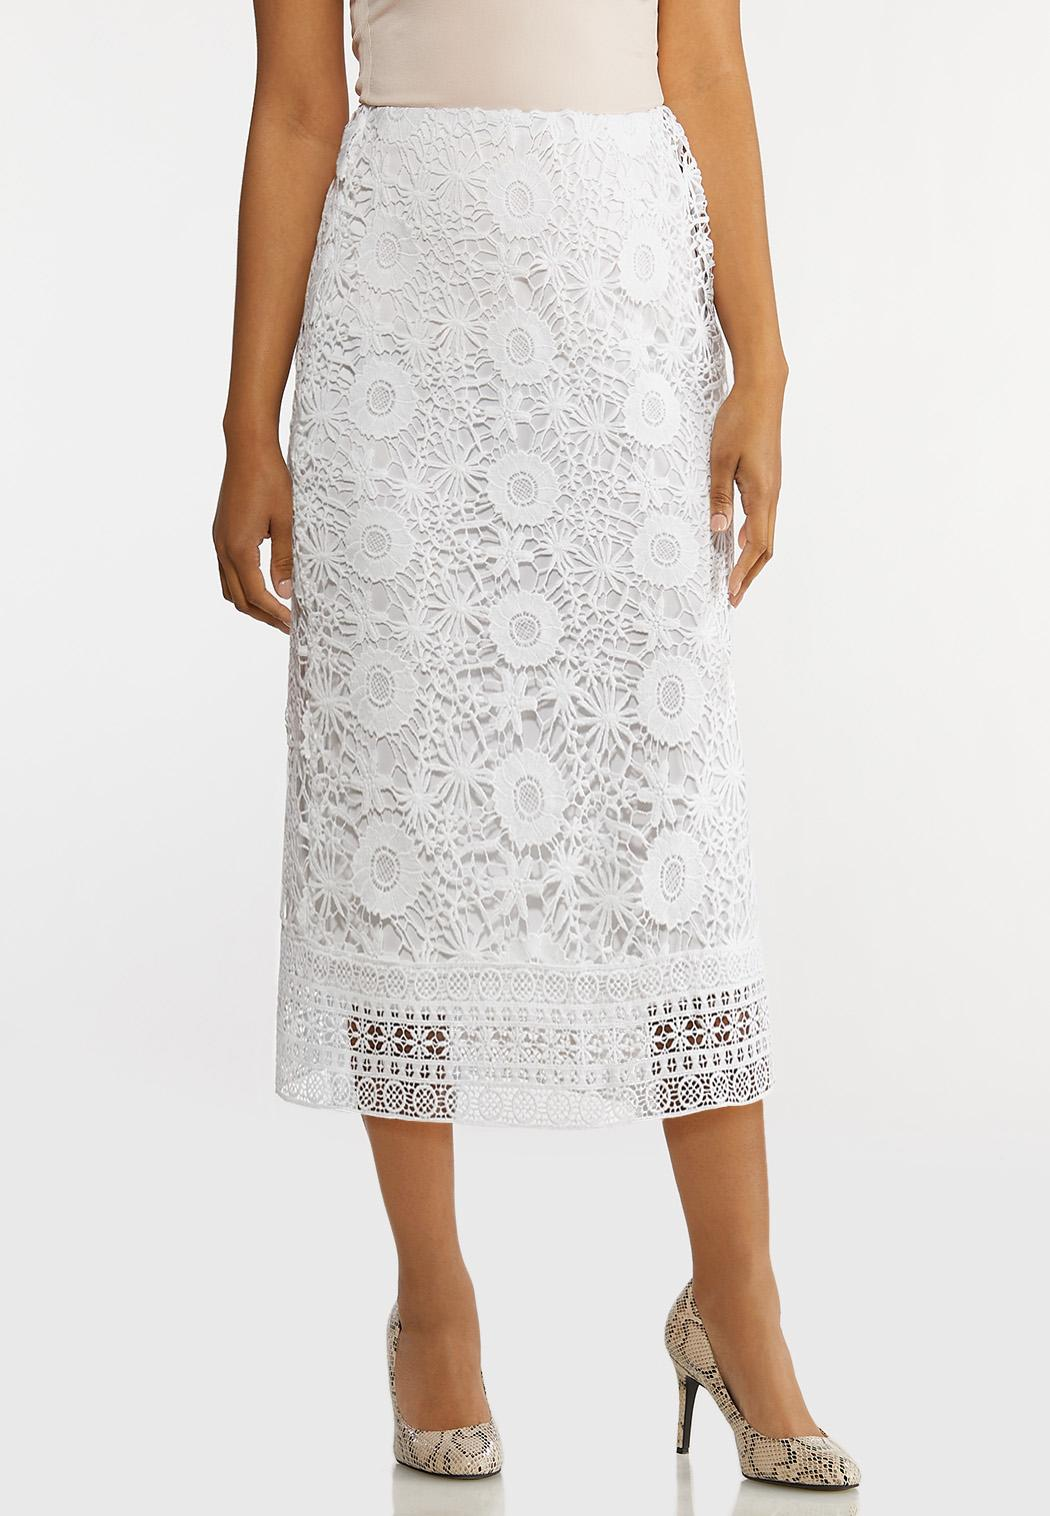 Plus Size White Crochet Pencil Skirt